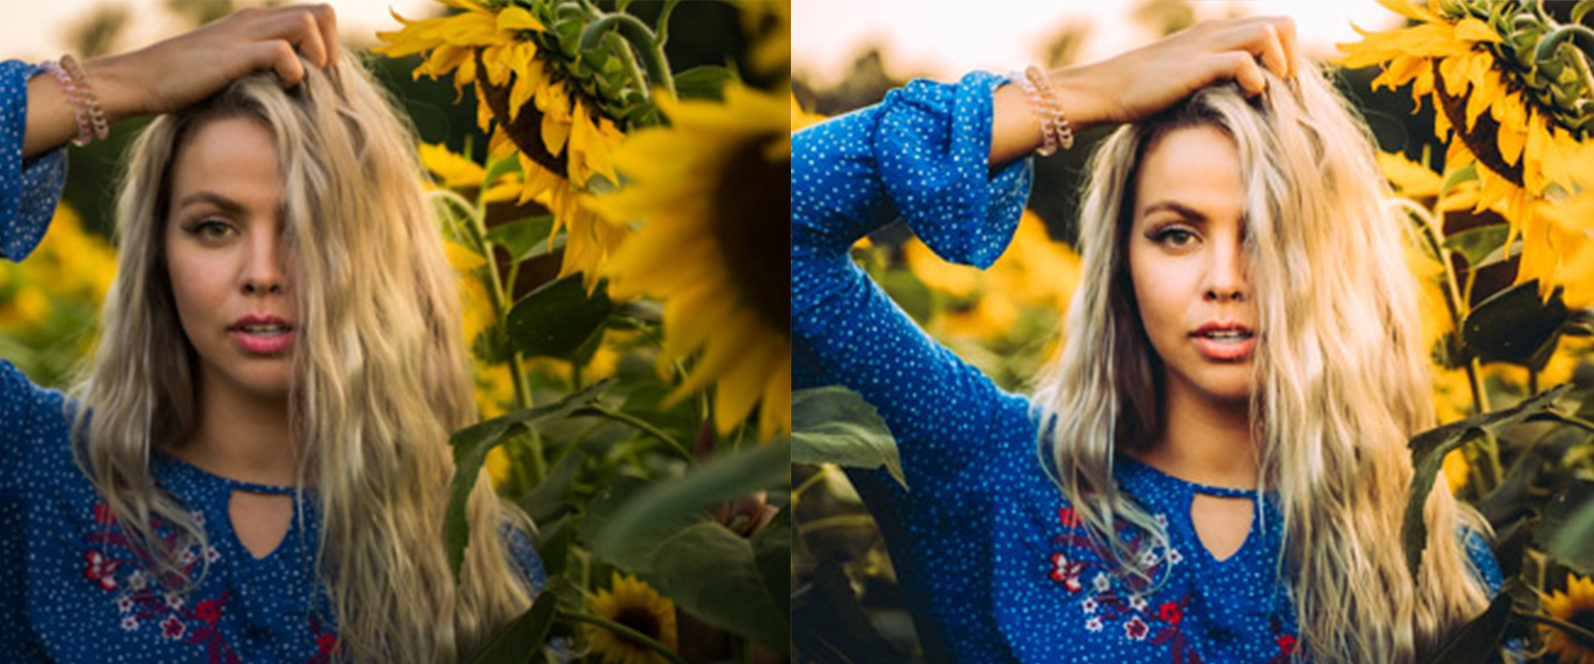 12 x Sunflower Fields Lightroom Presets   Warm Lightroom Presets   Yellow Presets - 8 Sunflower Fields -